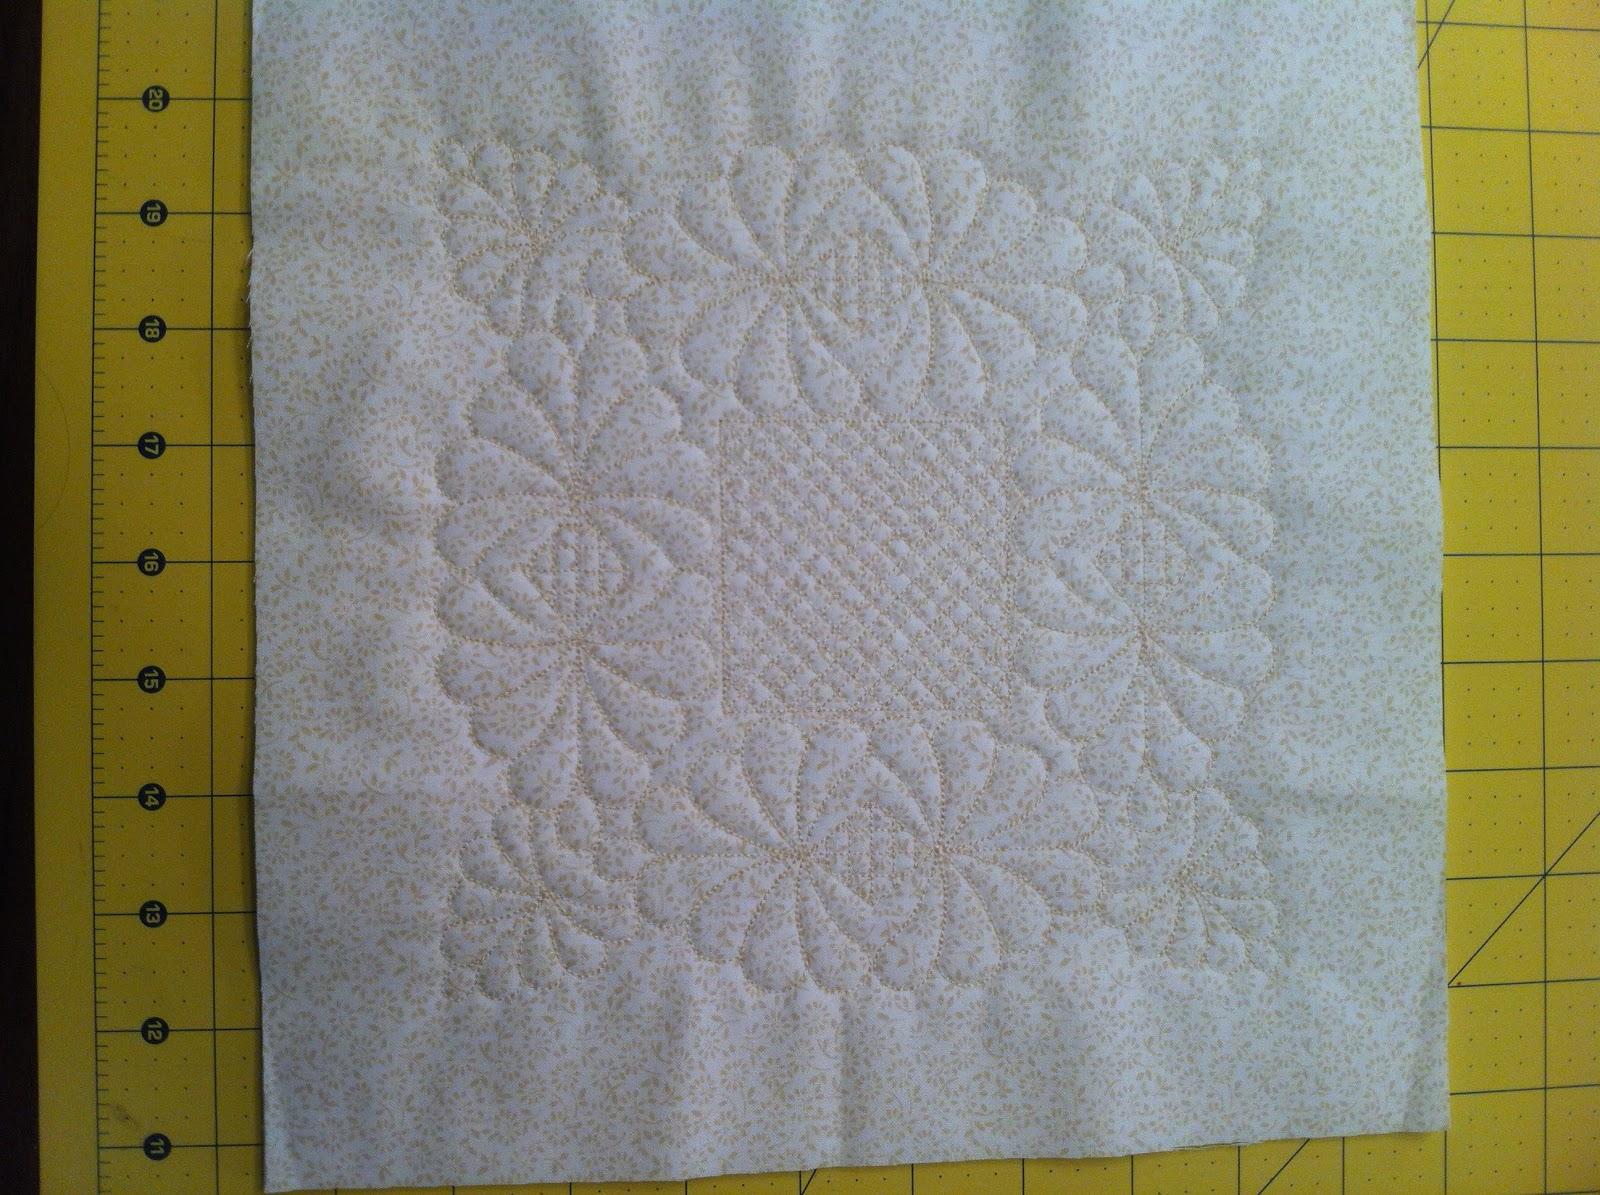 Husqvarna Viking Quilting Designs : Pfaff Husqvarna Viking 5D Quilt Design Creator Embroidery ...